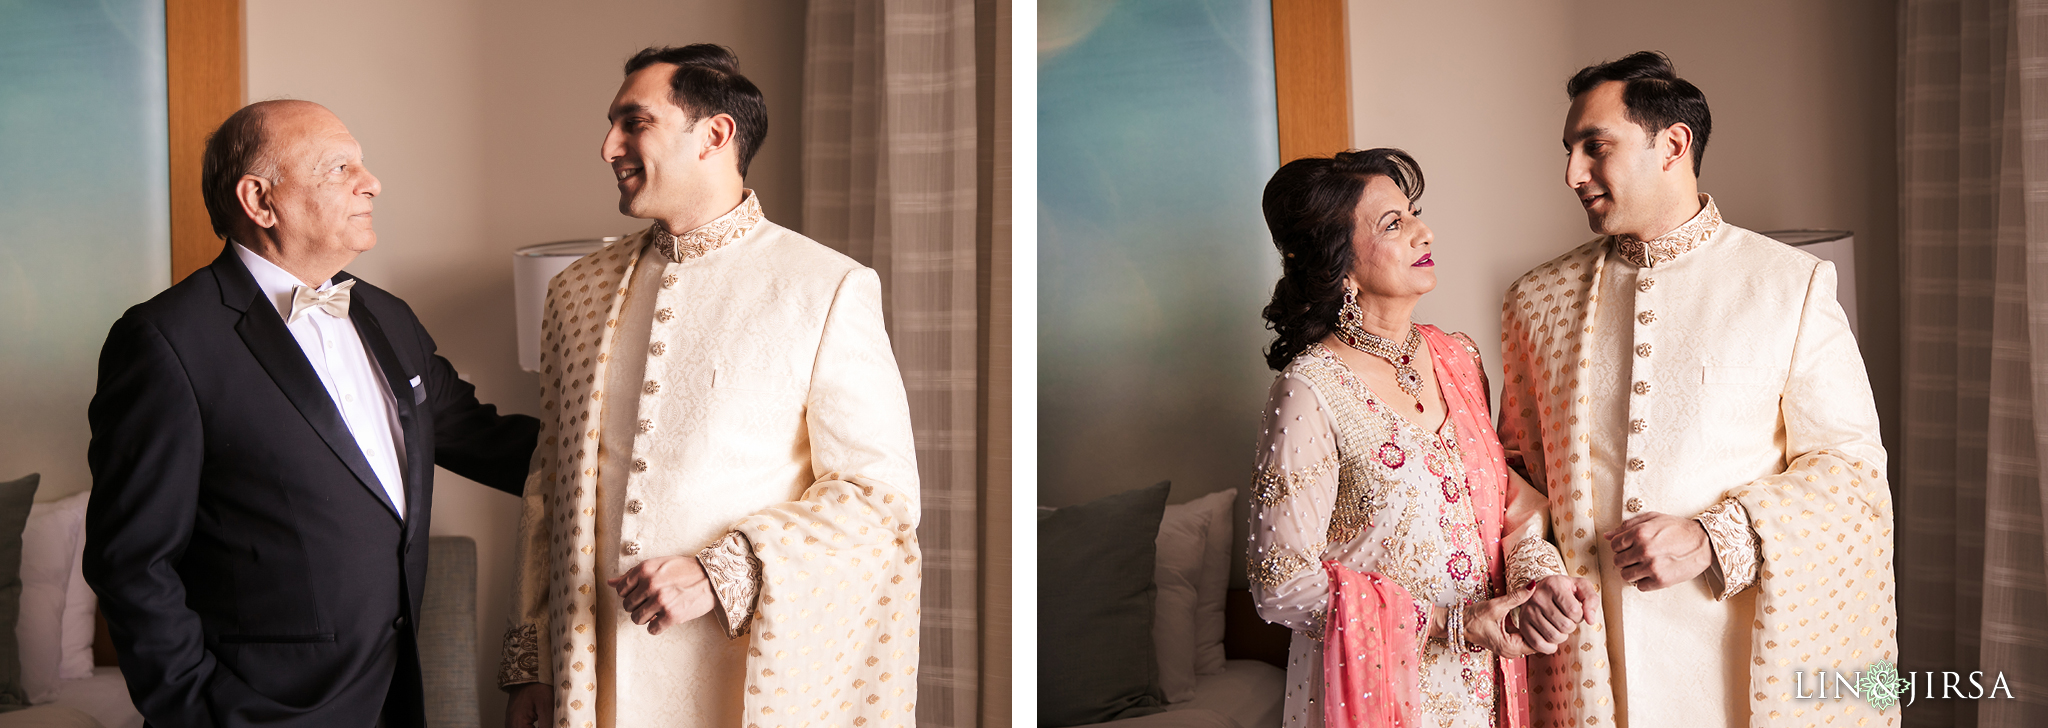 09 pasea hotel spa huntington beach pakistani muslim wedding photography